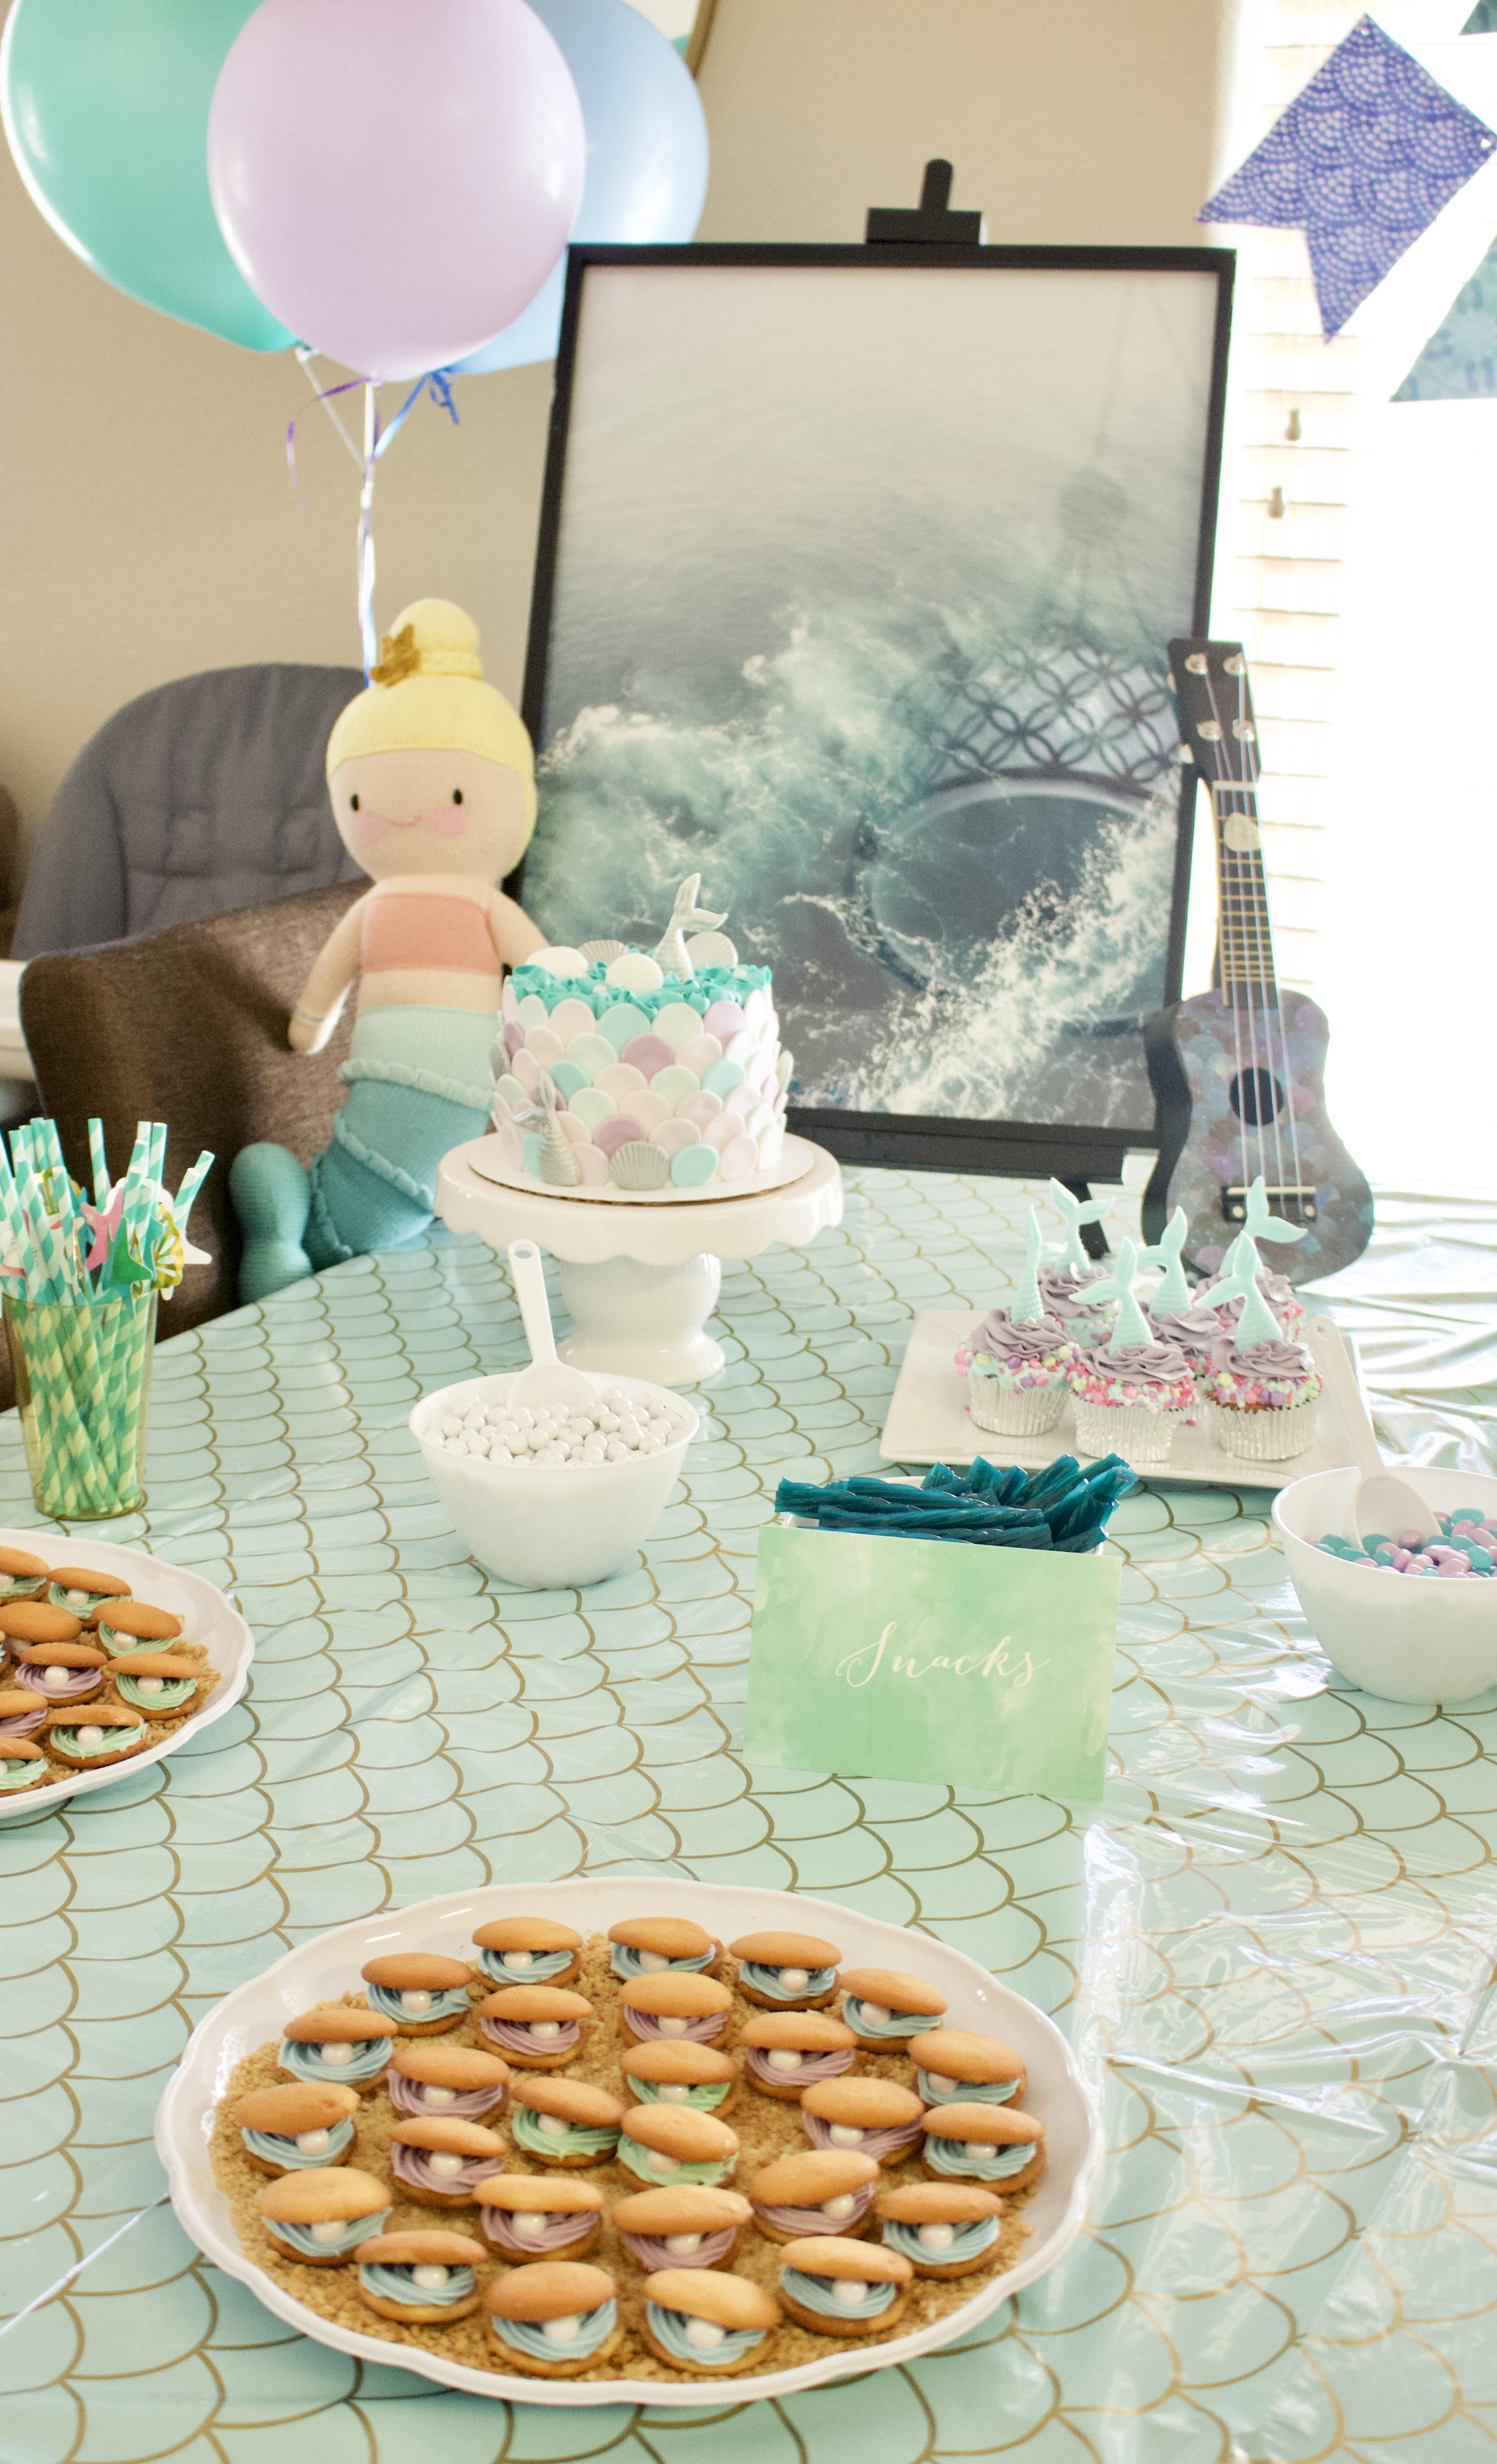 mermaid party diy decor #birthdayparty #kidsbirthday #mermaidbirthday #mermaidparty